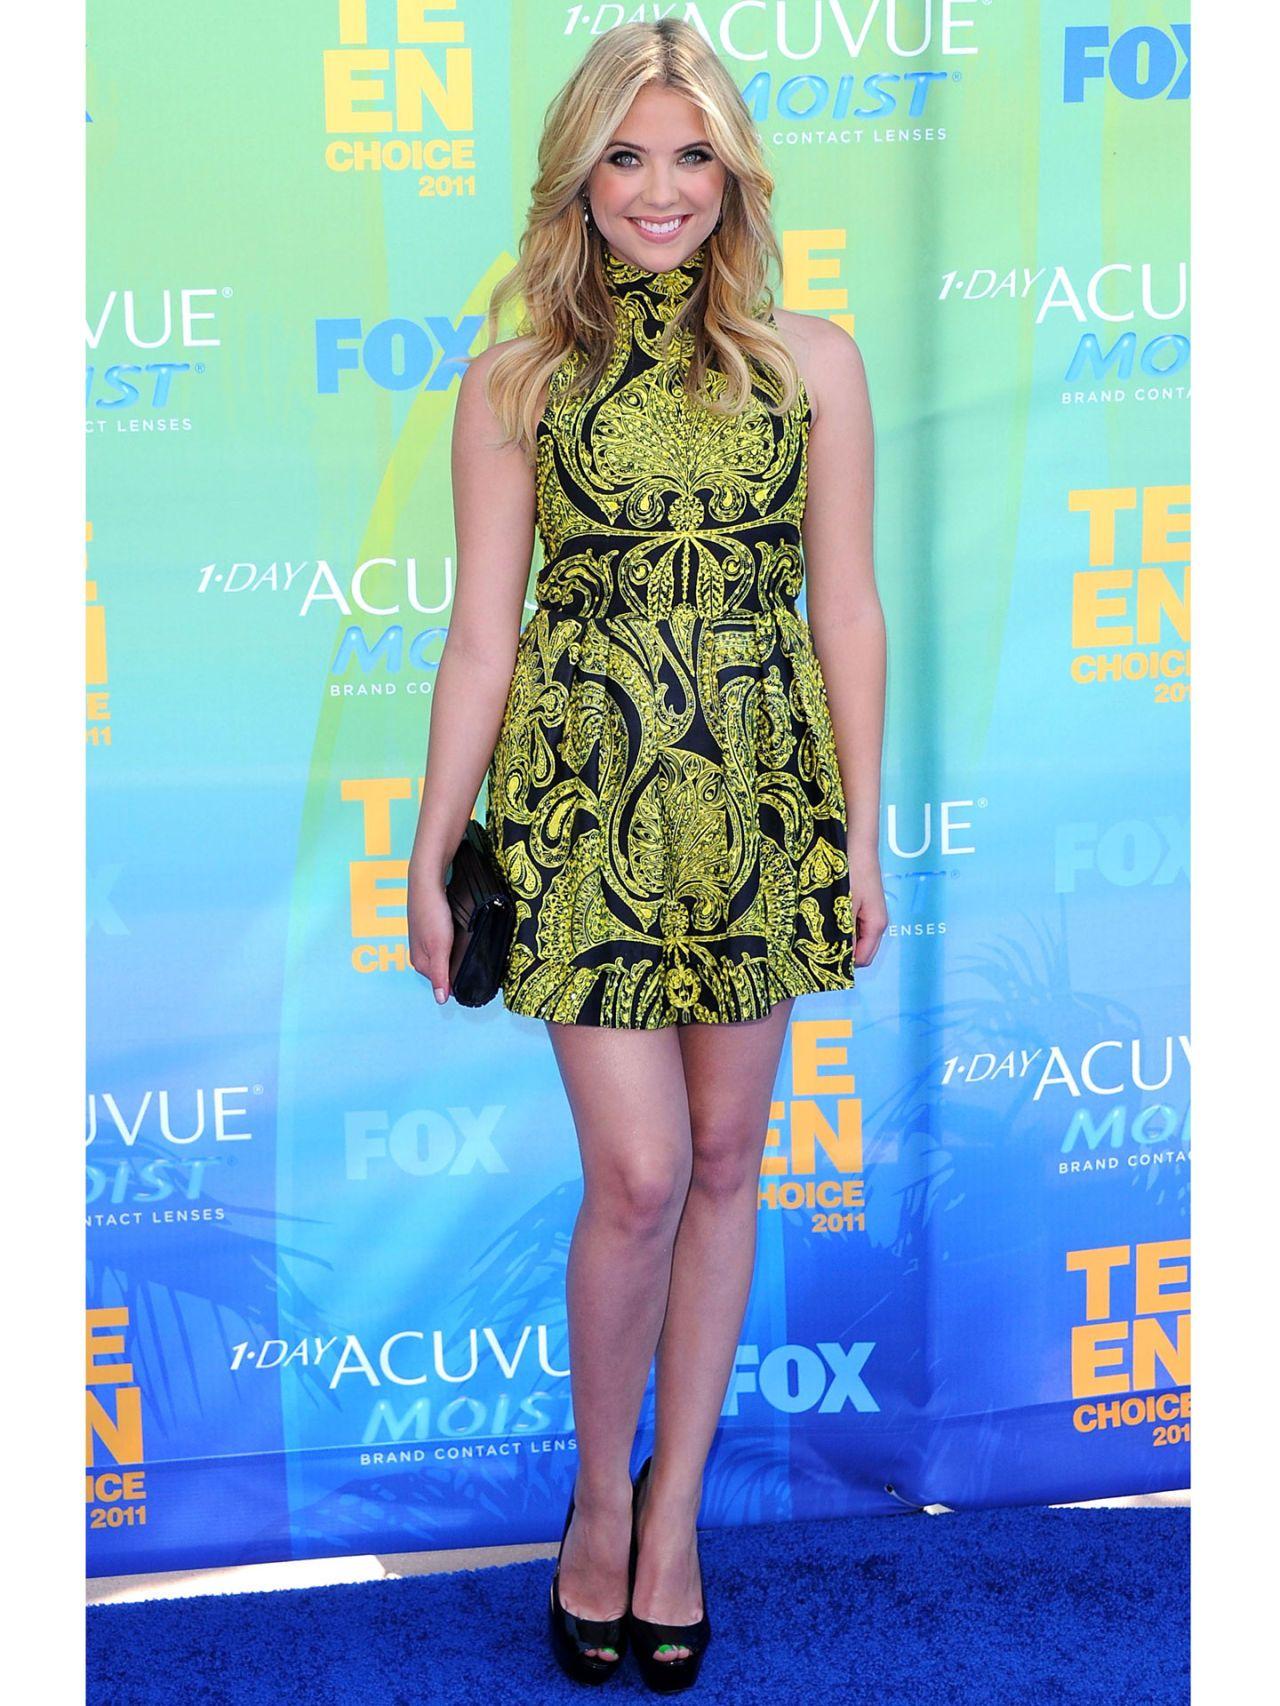 Ashley Benson Style Pictures - Ashley Benson Fashion Makeover